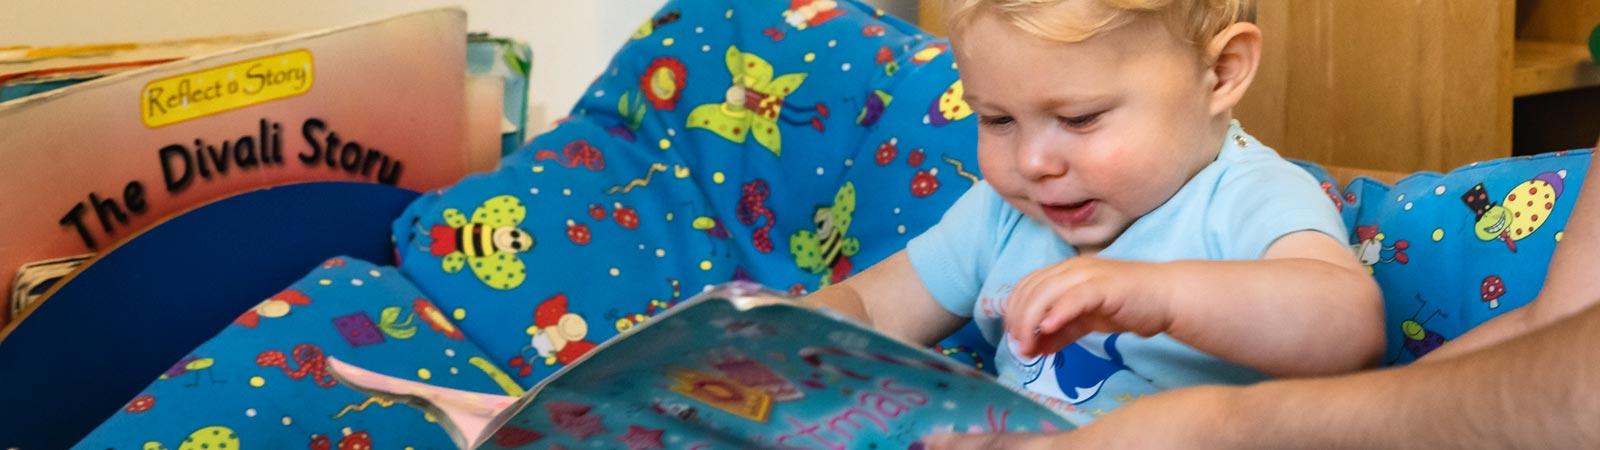 Blog: latest news, updates & information from Little Cedars Day Nursery, Streatham, SW16.